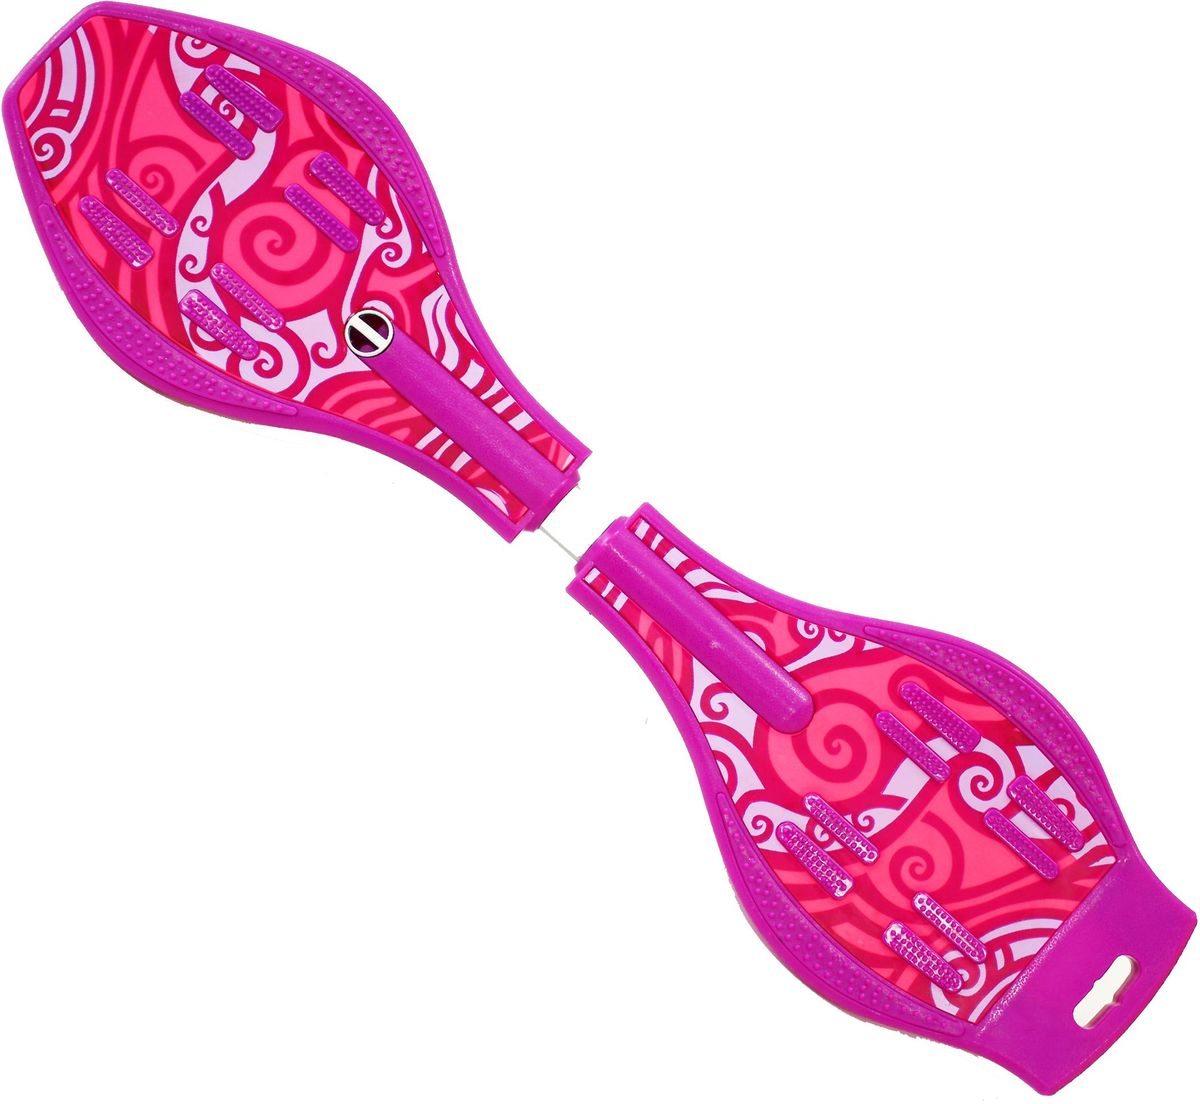 Роллерсерф Dragon Board  Totem , цвет: фуксия, розовый - Скейтборды и пенни борды